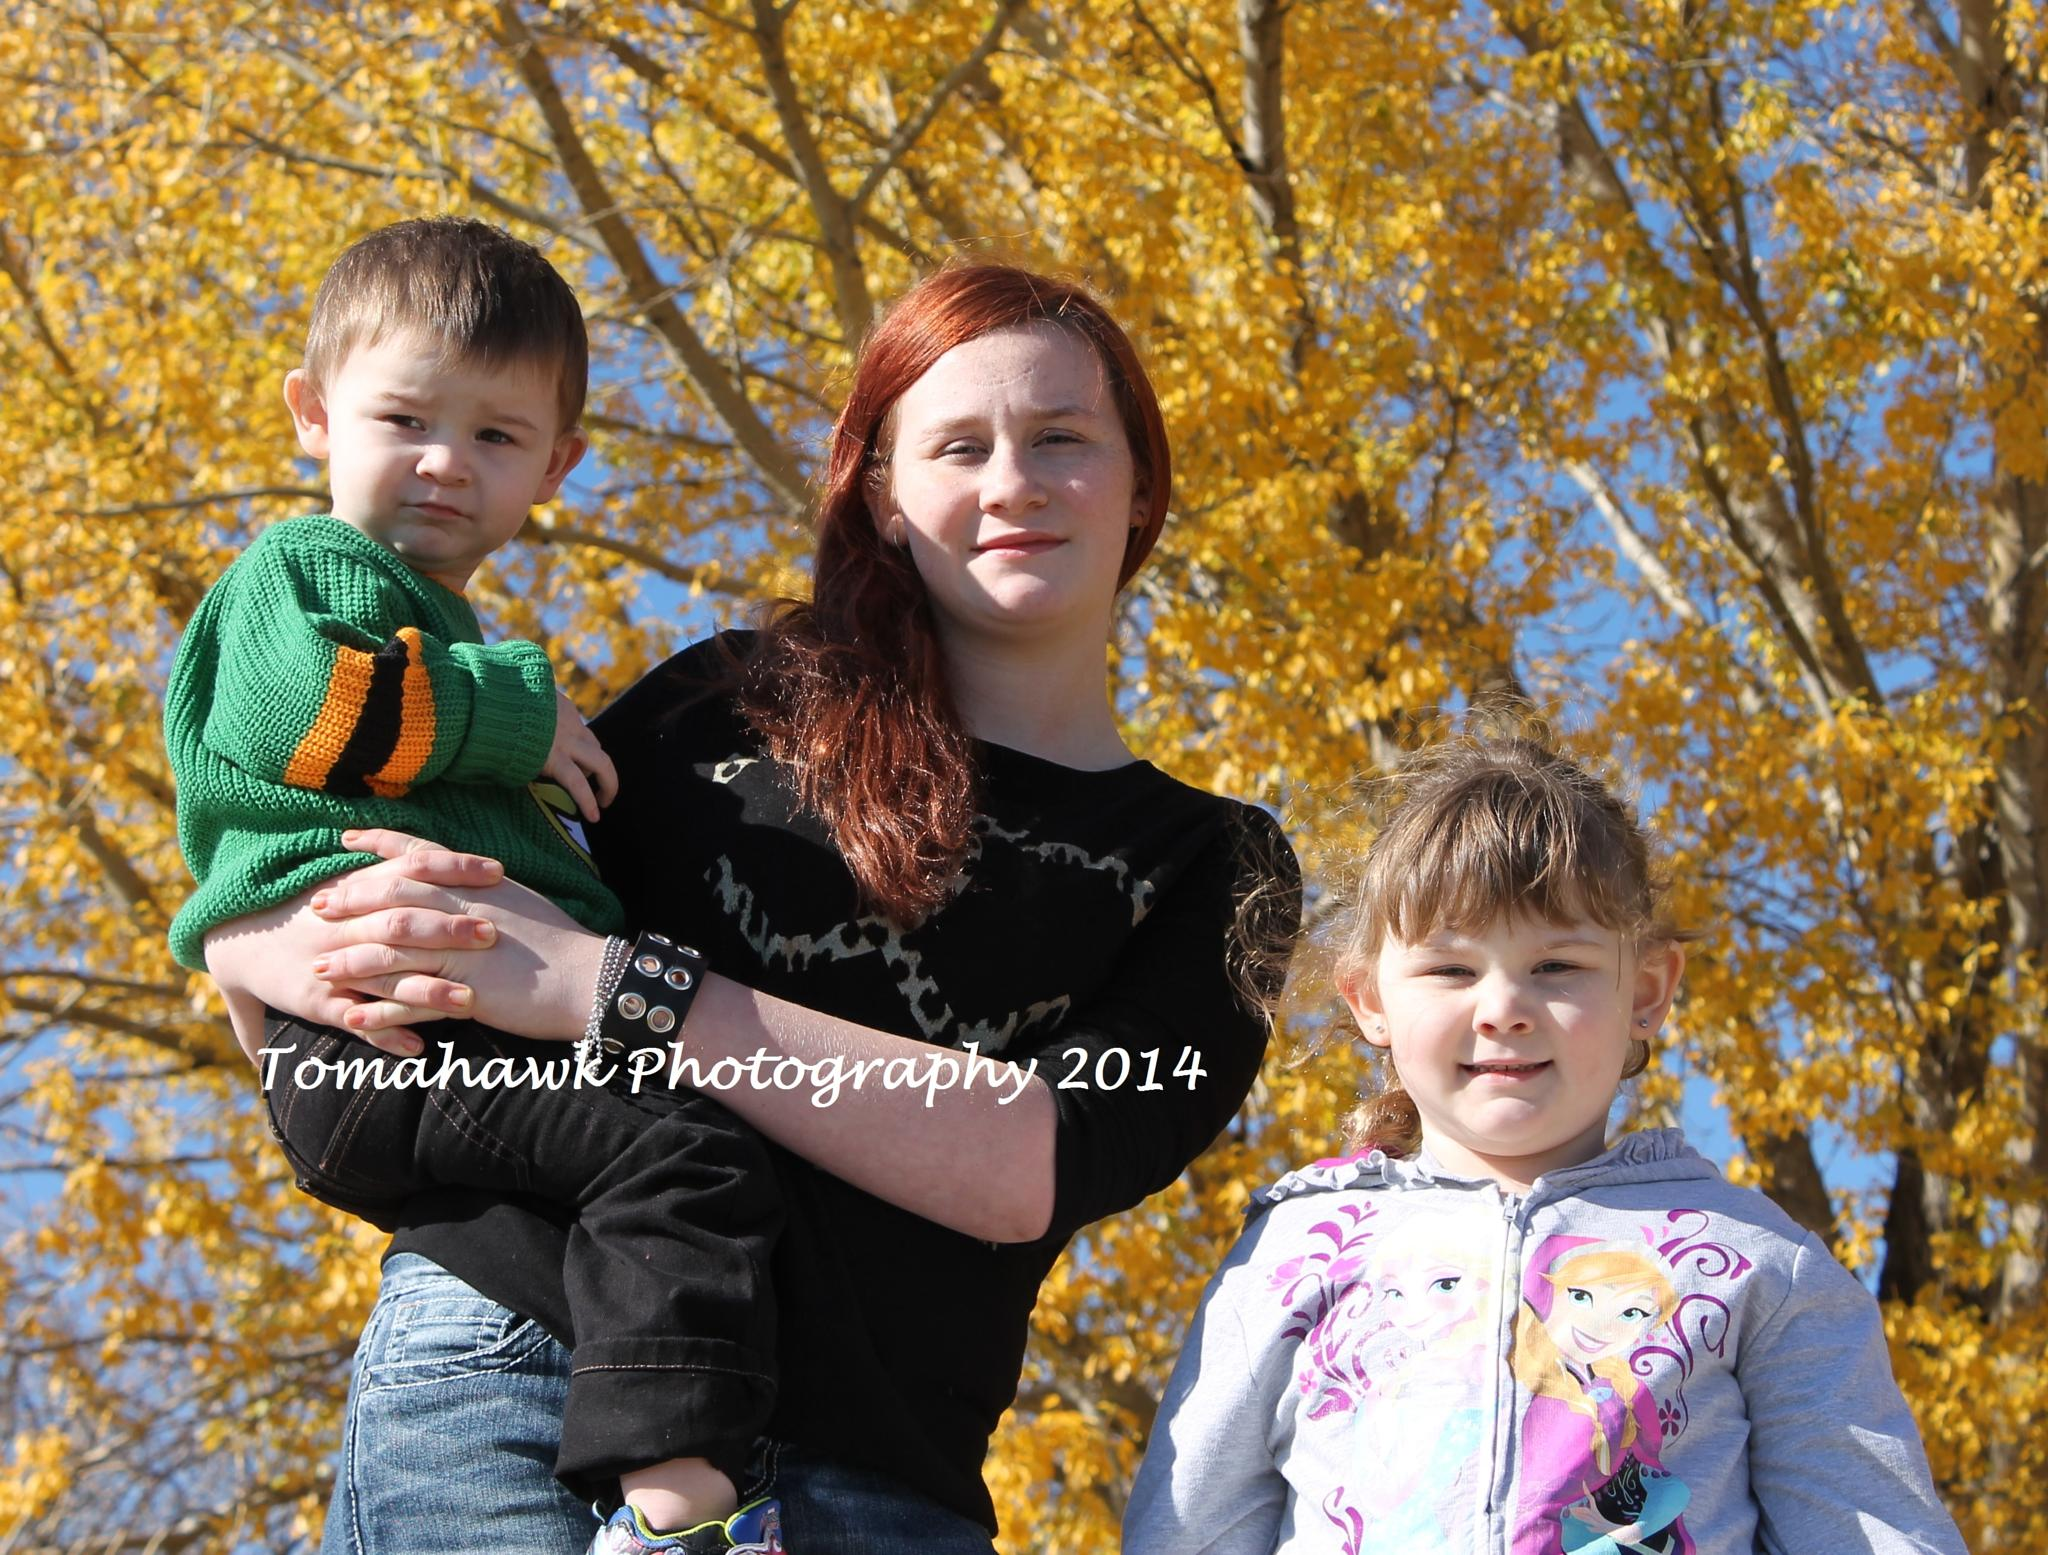 Teri Reilly Kids Photo Shoot 2014 by Thomas Mah